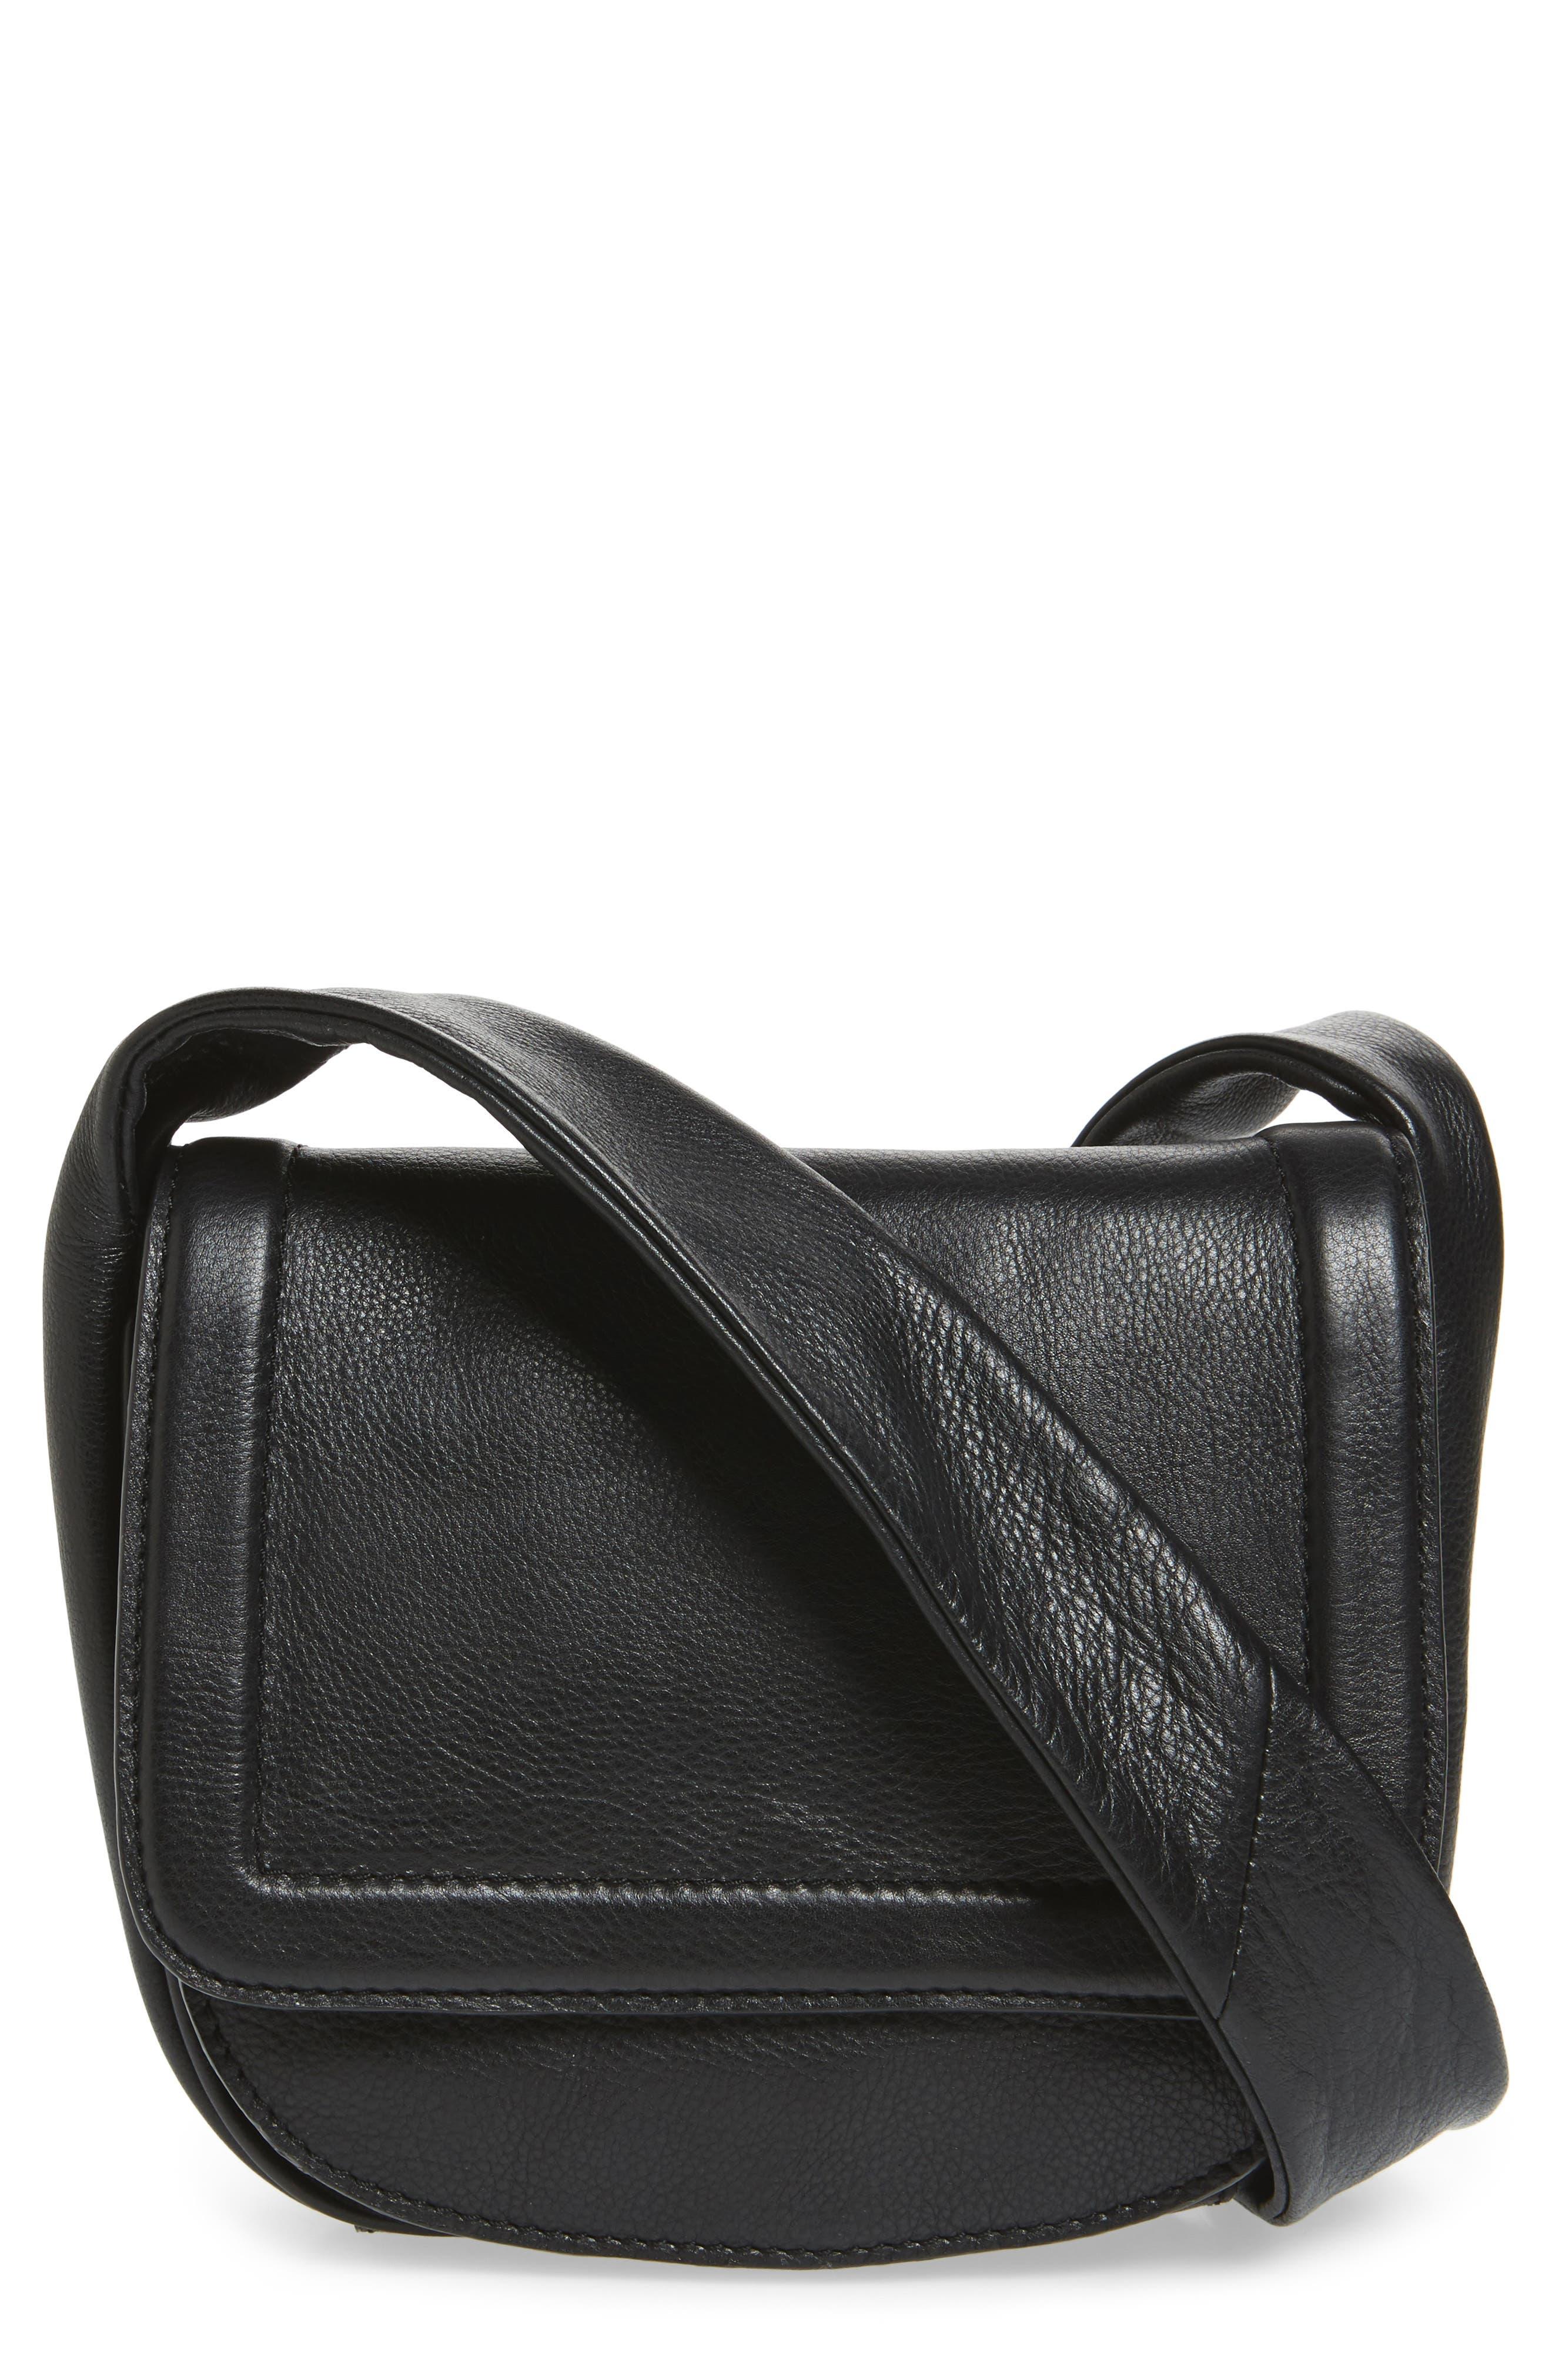 Jasmine Leather Saddle Bag,                         Main,                         color, 001